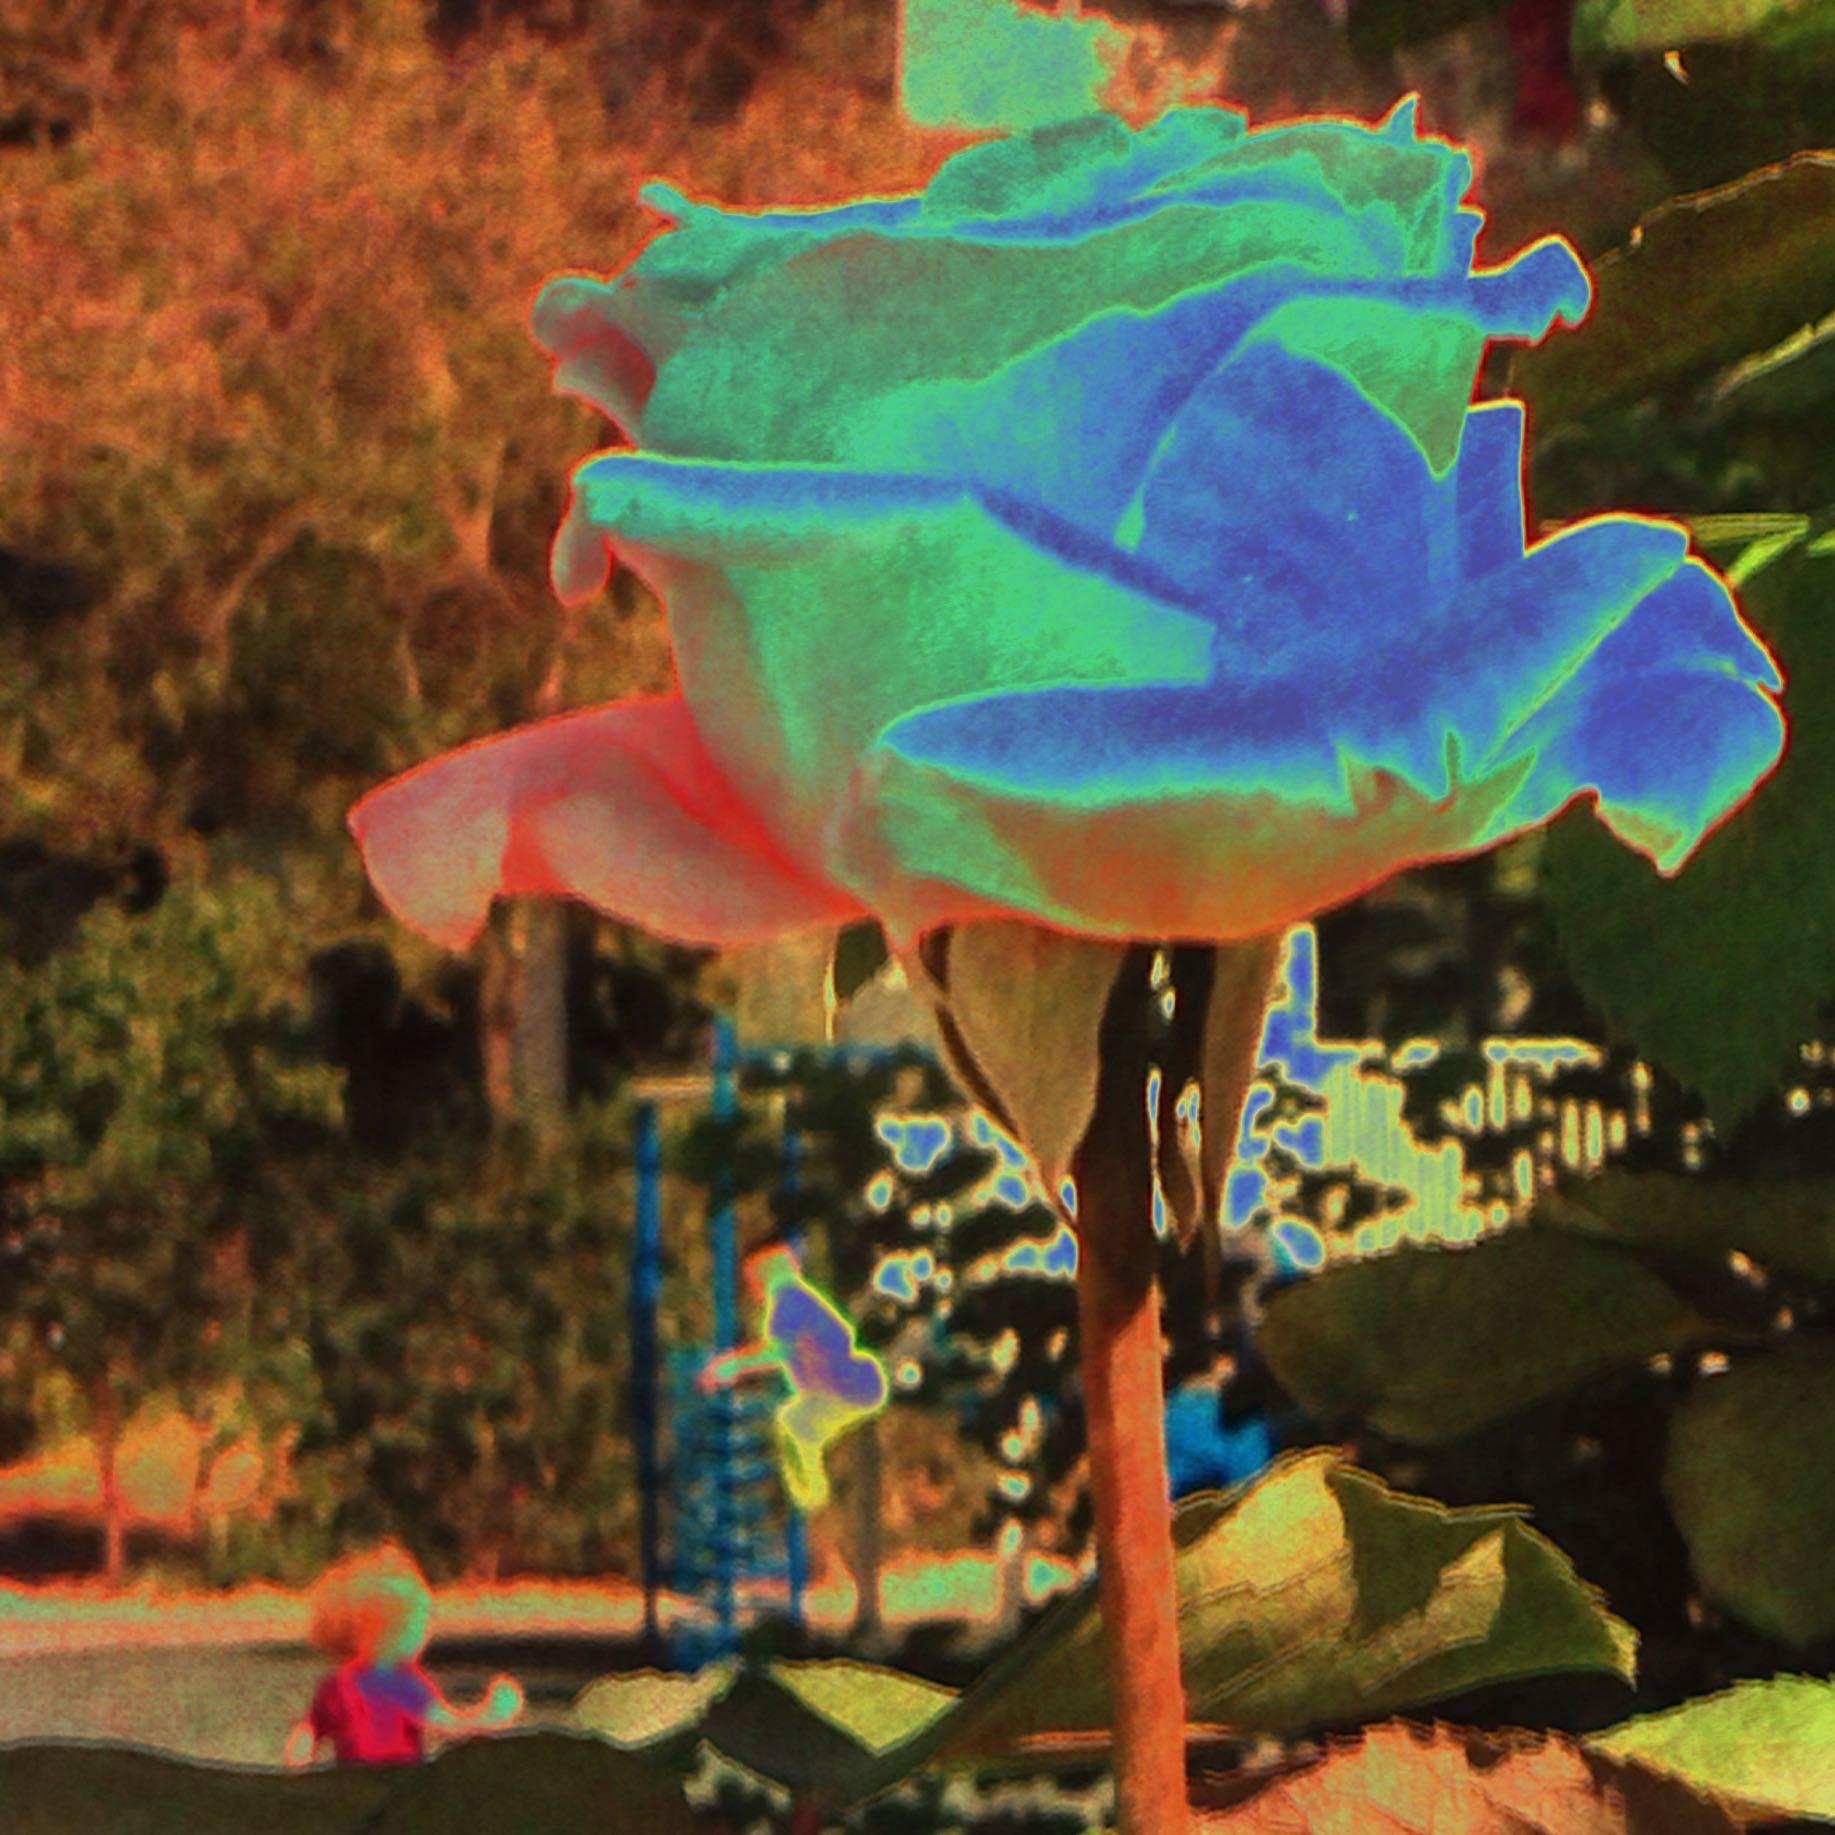 summer u2014prose poem with frogs u2013 meta phor e play